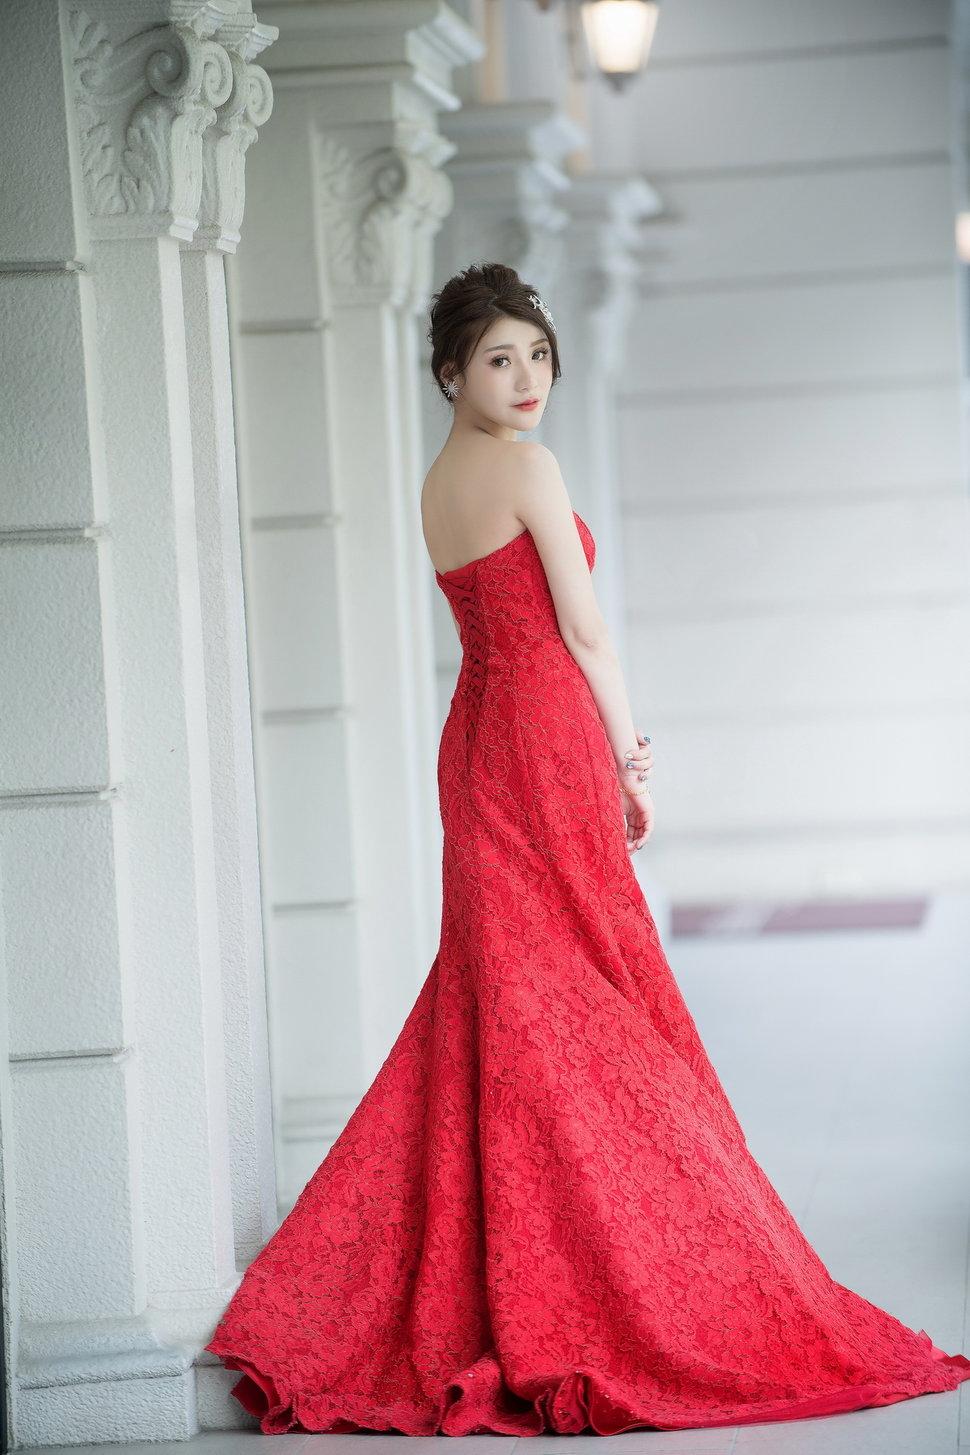 CON_4829-1 - 婚攝溏威自助婚紗婚禮紀錄新秘孕寫真全家福《結婚吧》